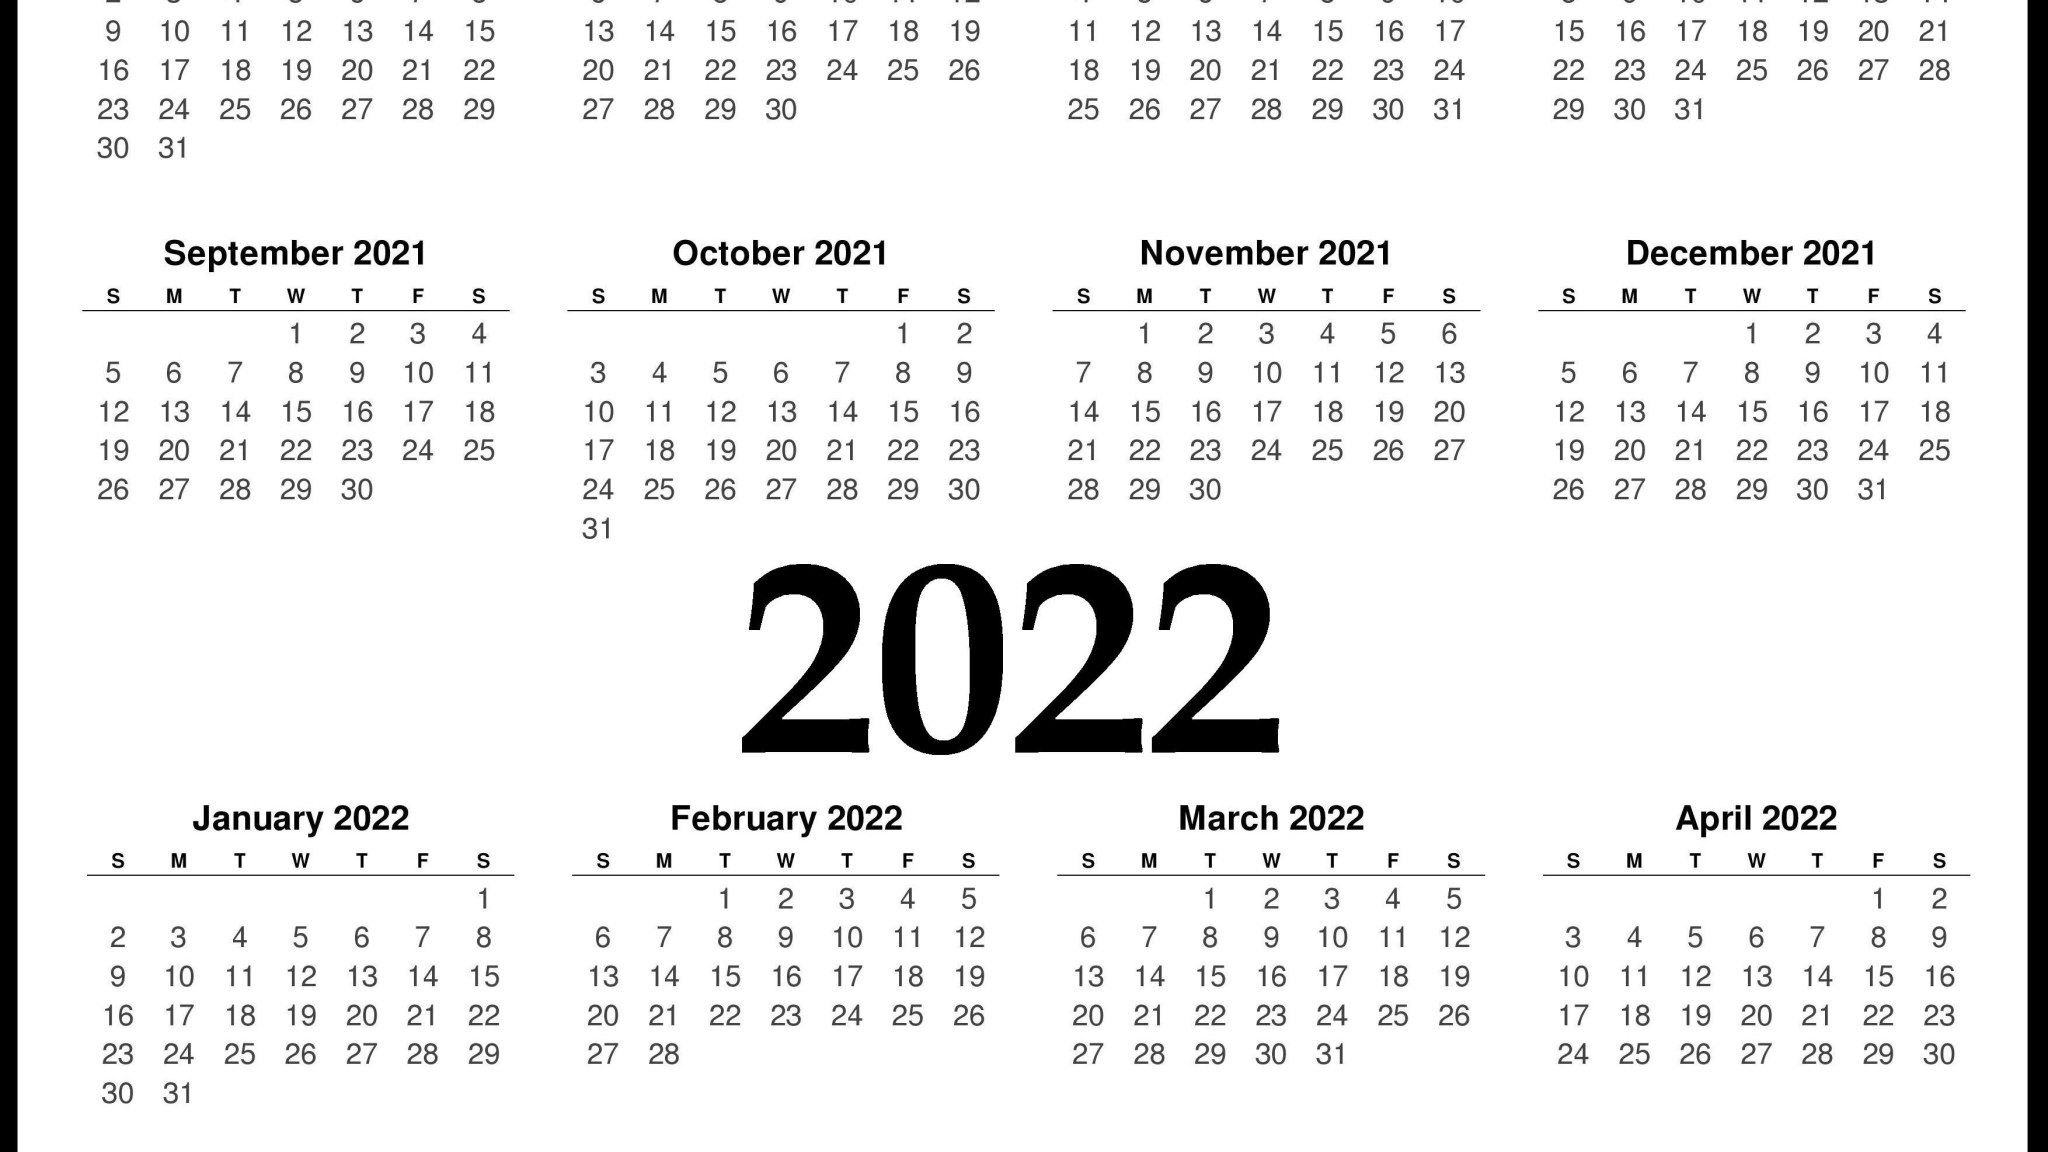 February 2022 Calendar Wallpaper.2022 Calendar Wallpapers Wallpaper Cave